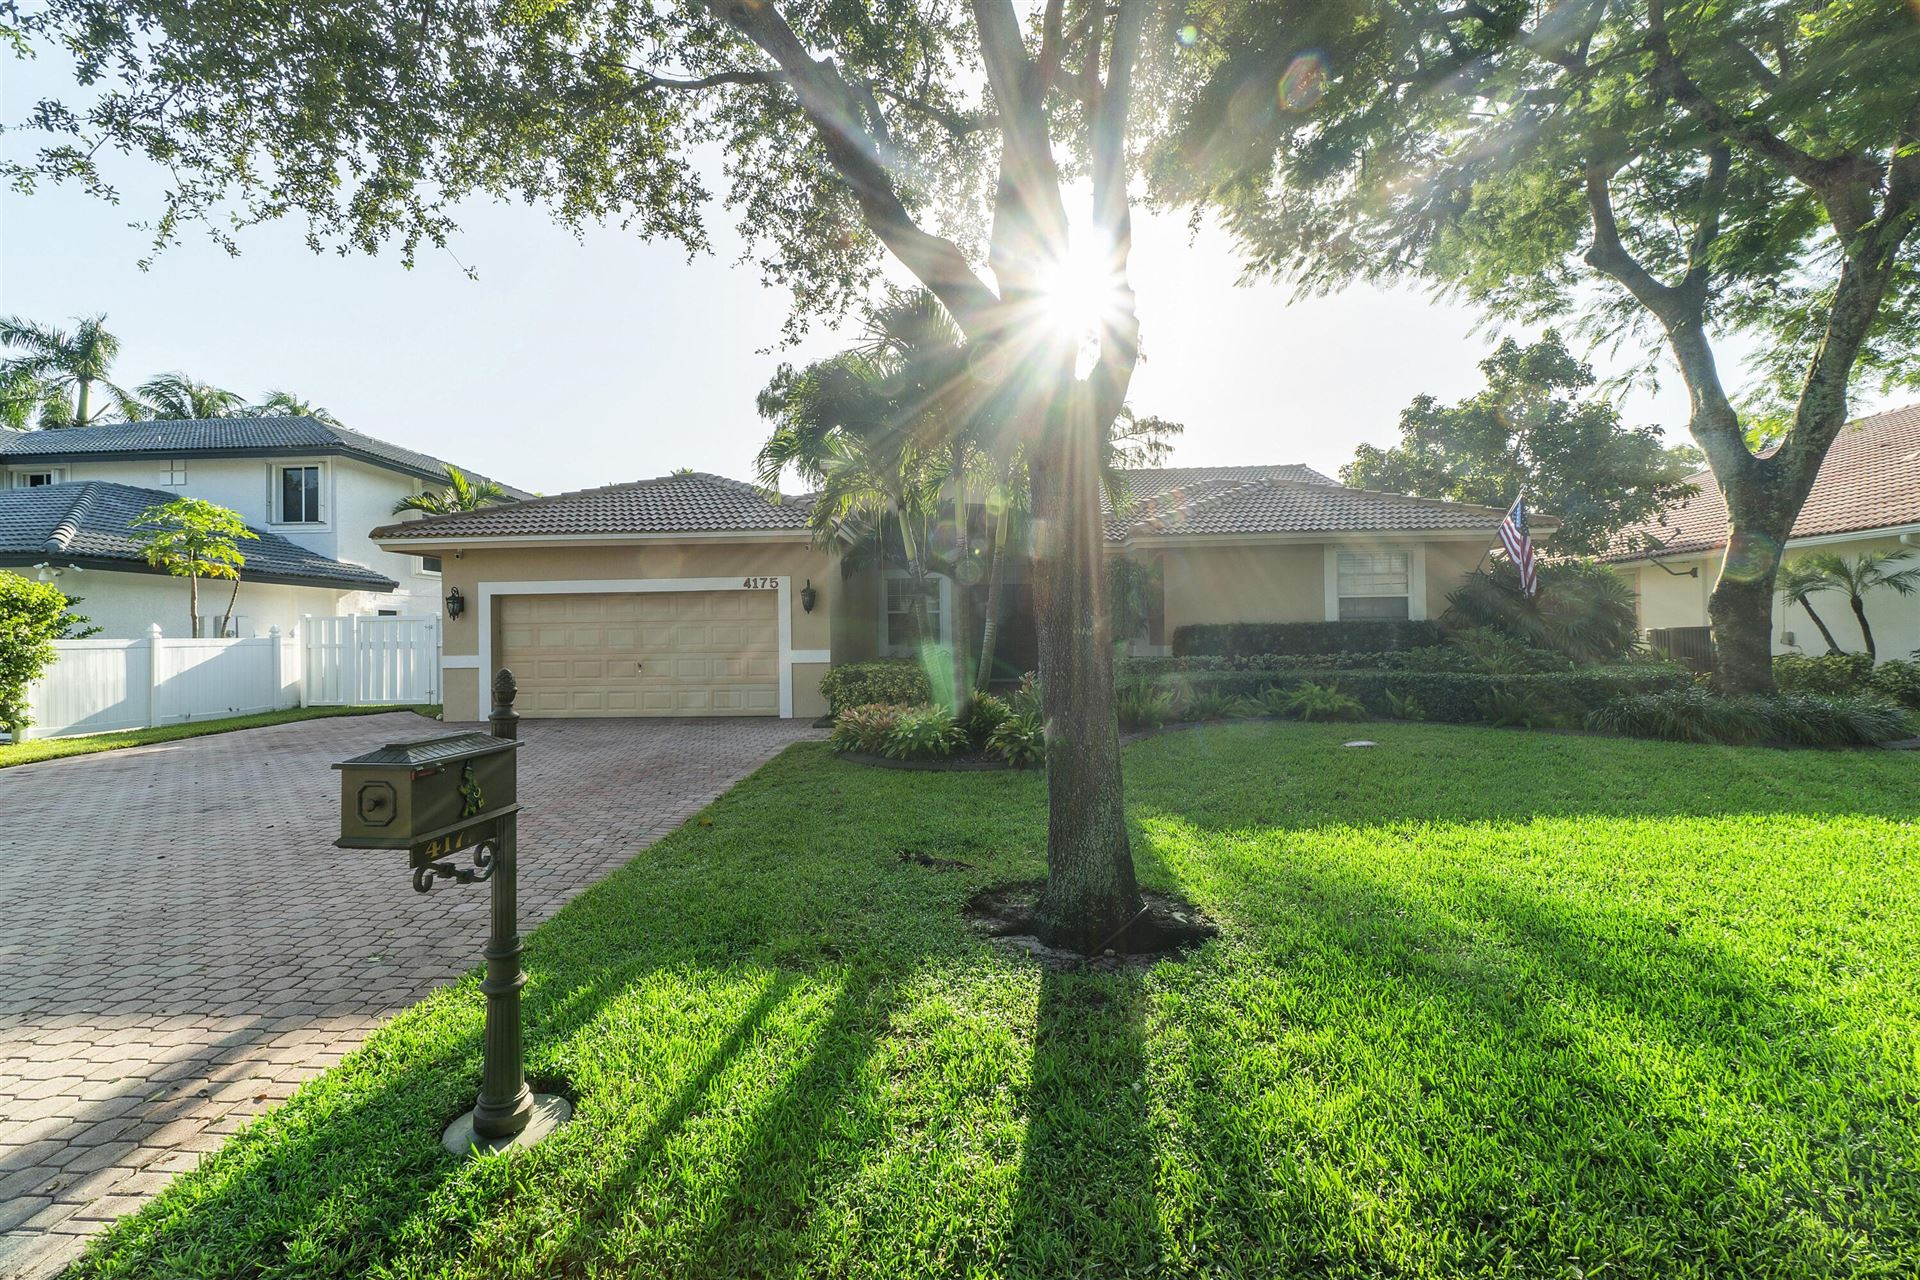 4175 NW 67th Way, Coral Springs, FL 33067 - MLS#: RX-10745125